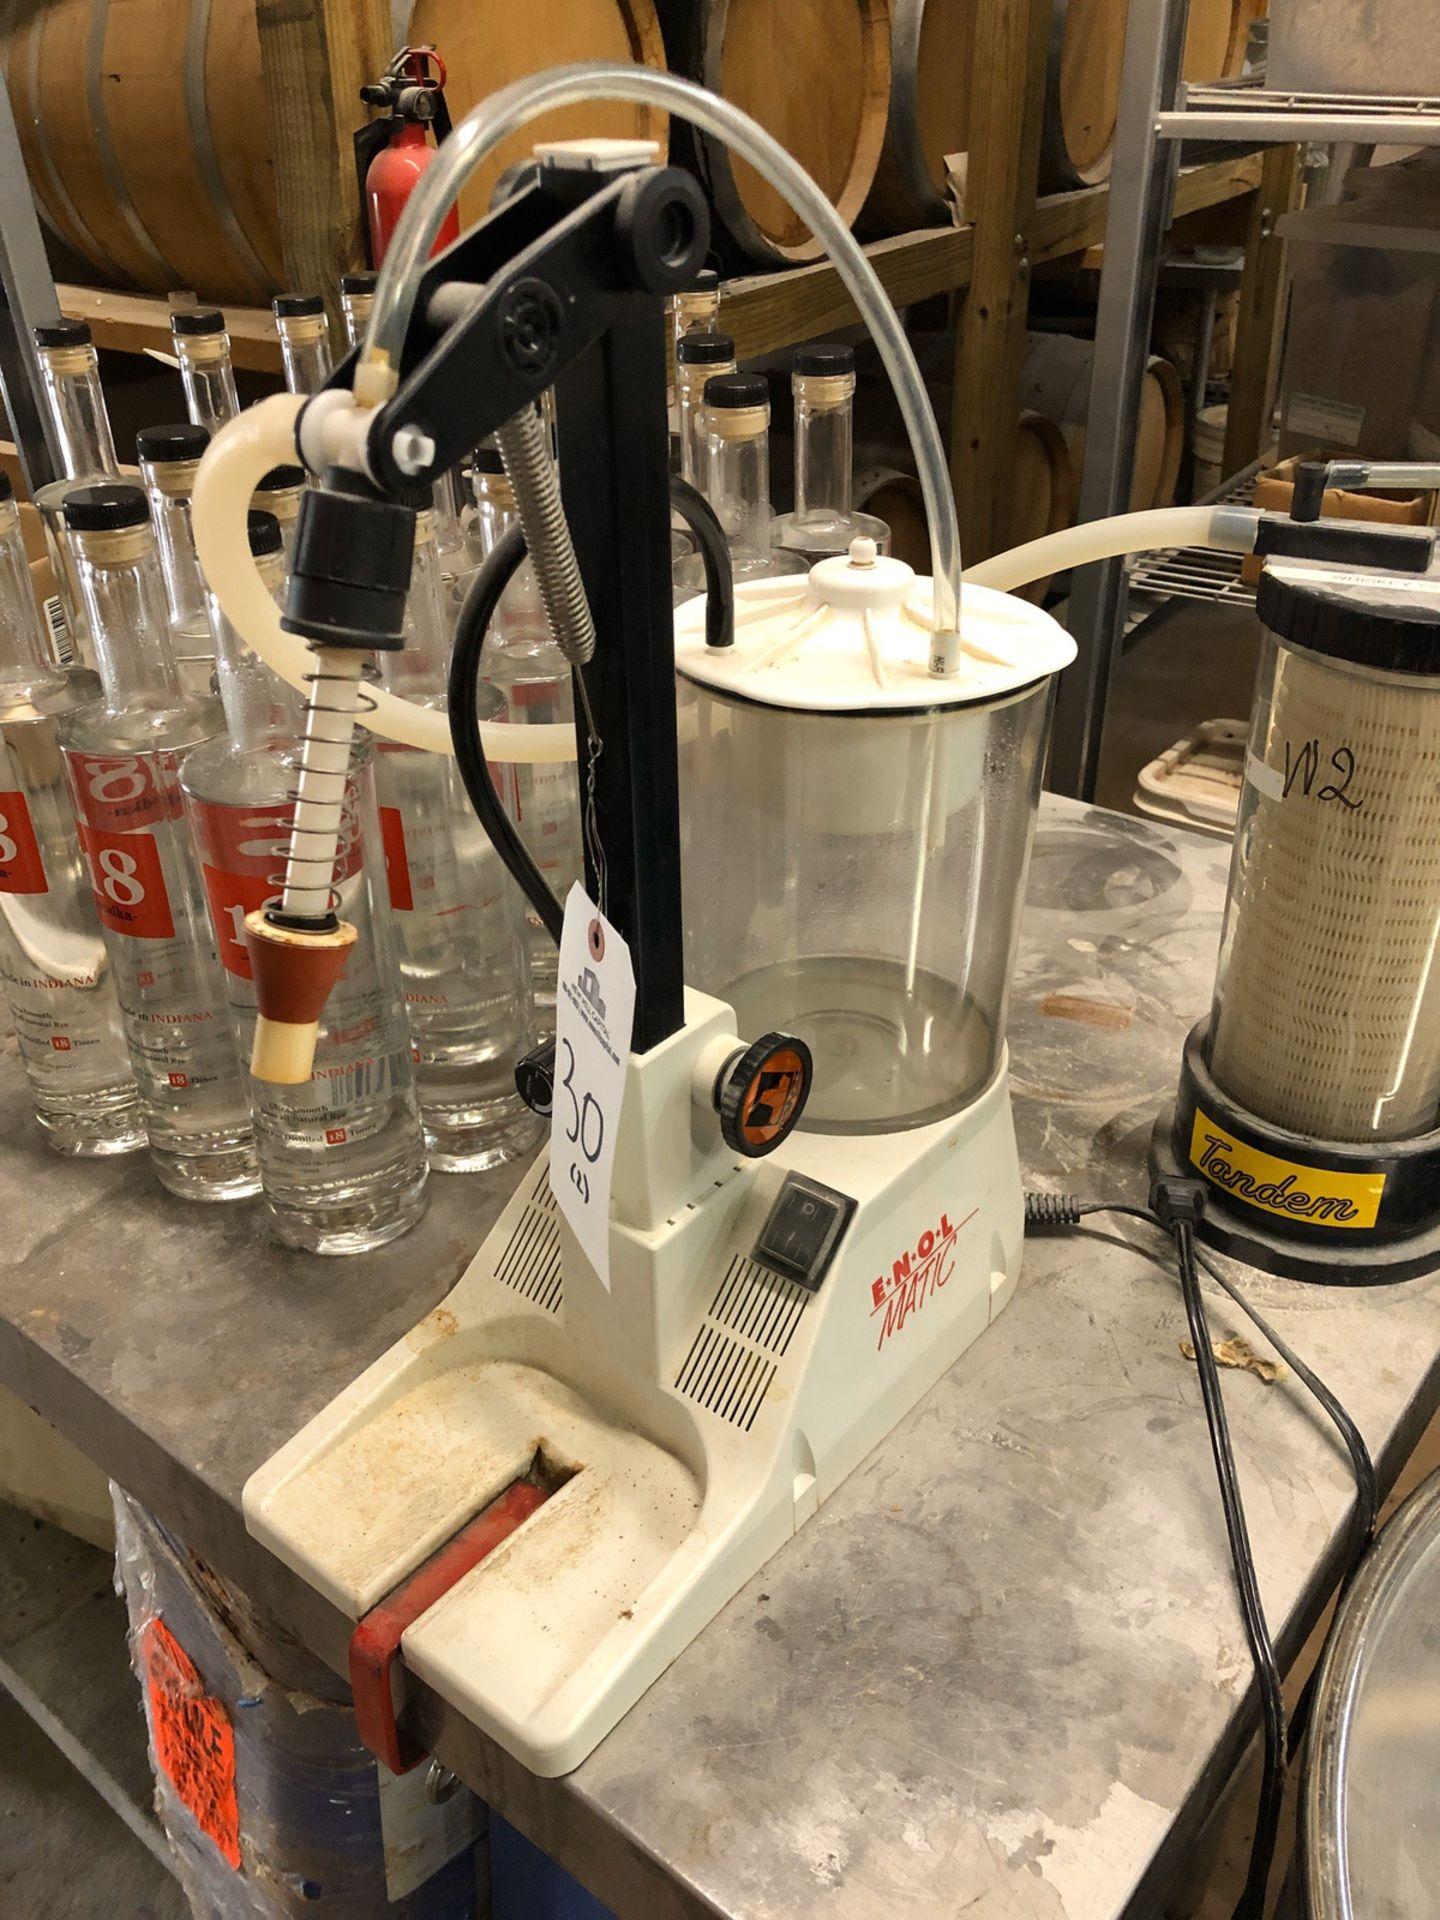 Lot 30 - (2) Enol Matic Bottle Fillers | Sub to Bulk | Rig Fee: $30 or HC